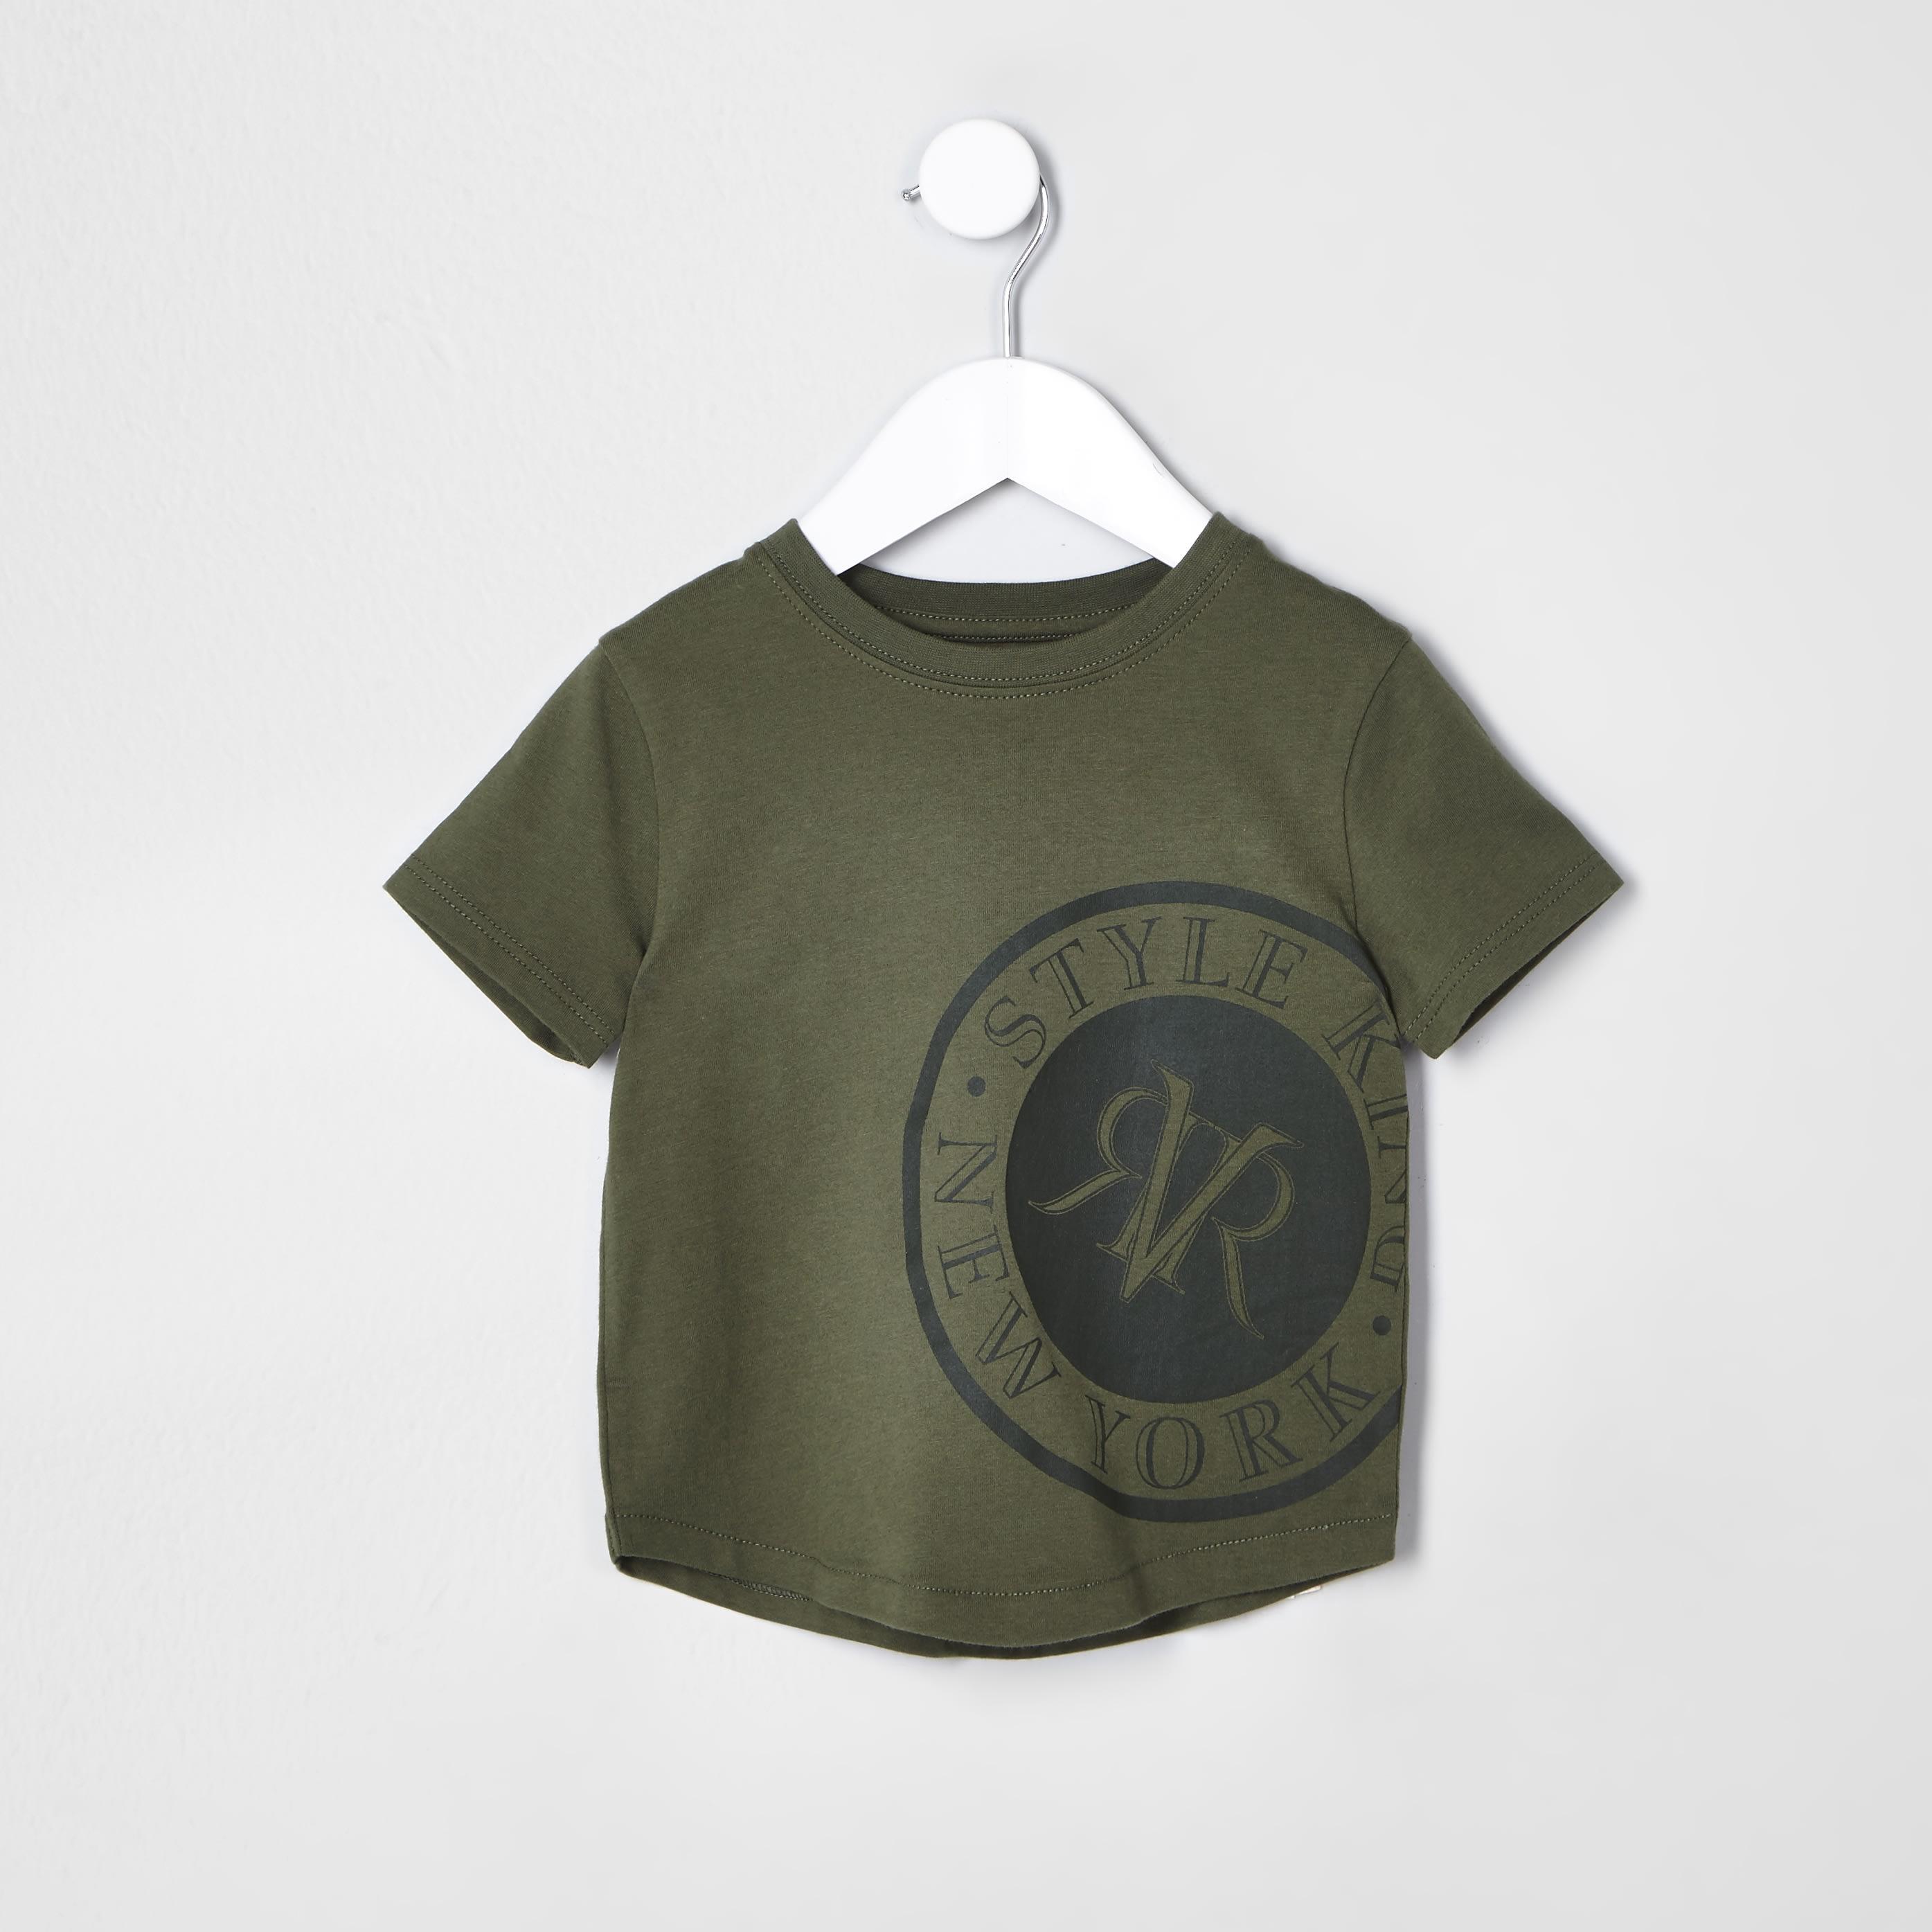 River Island Mens Baby Boys Khaki 'New York' T-shirt (3-6 Mths)